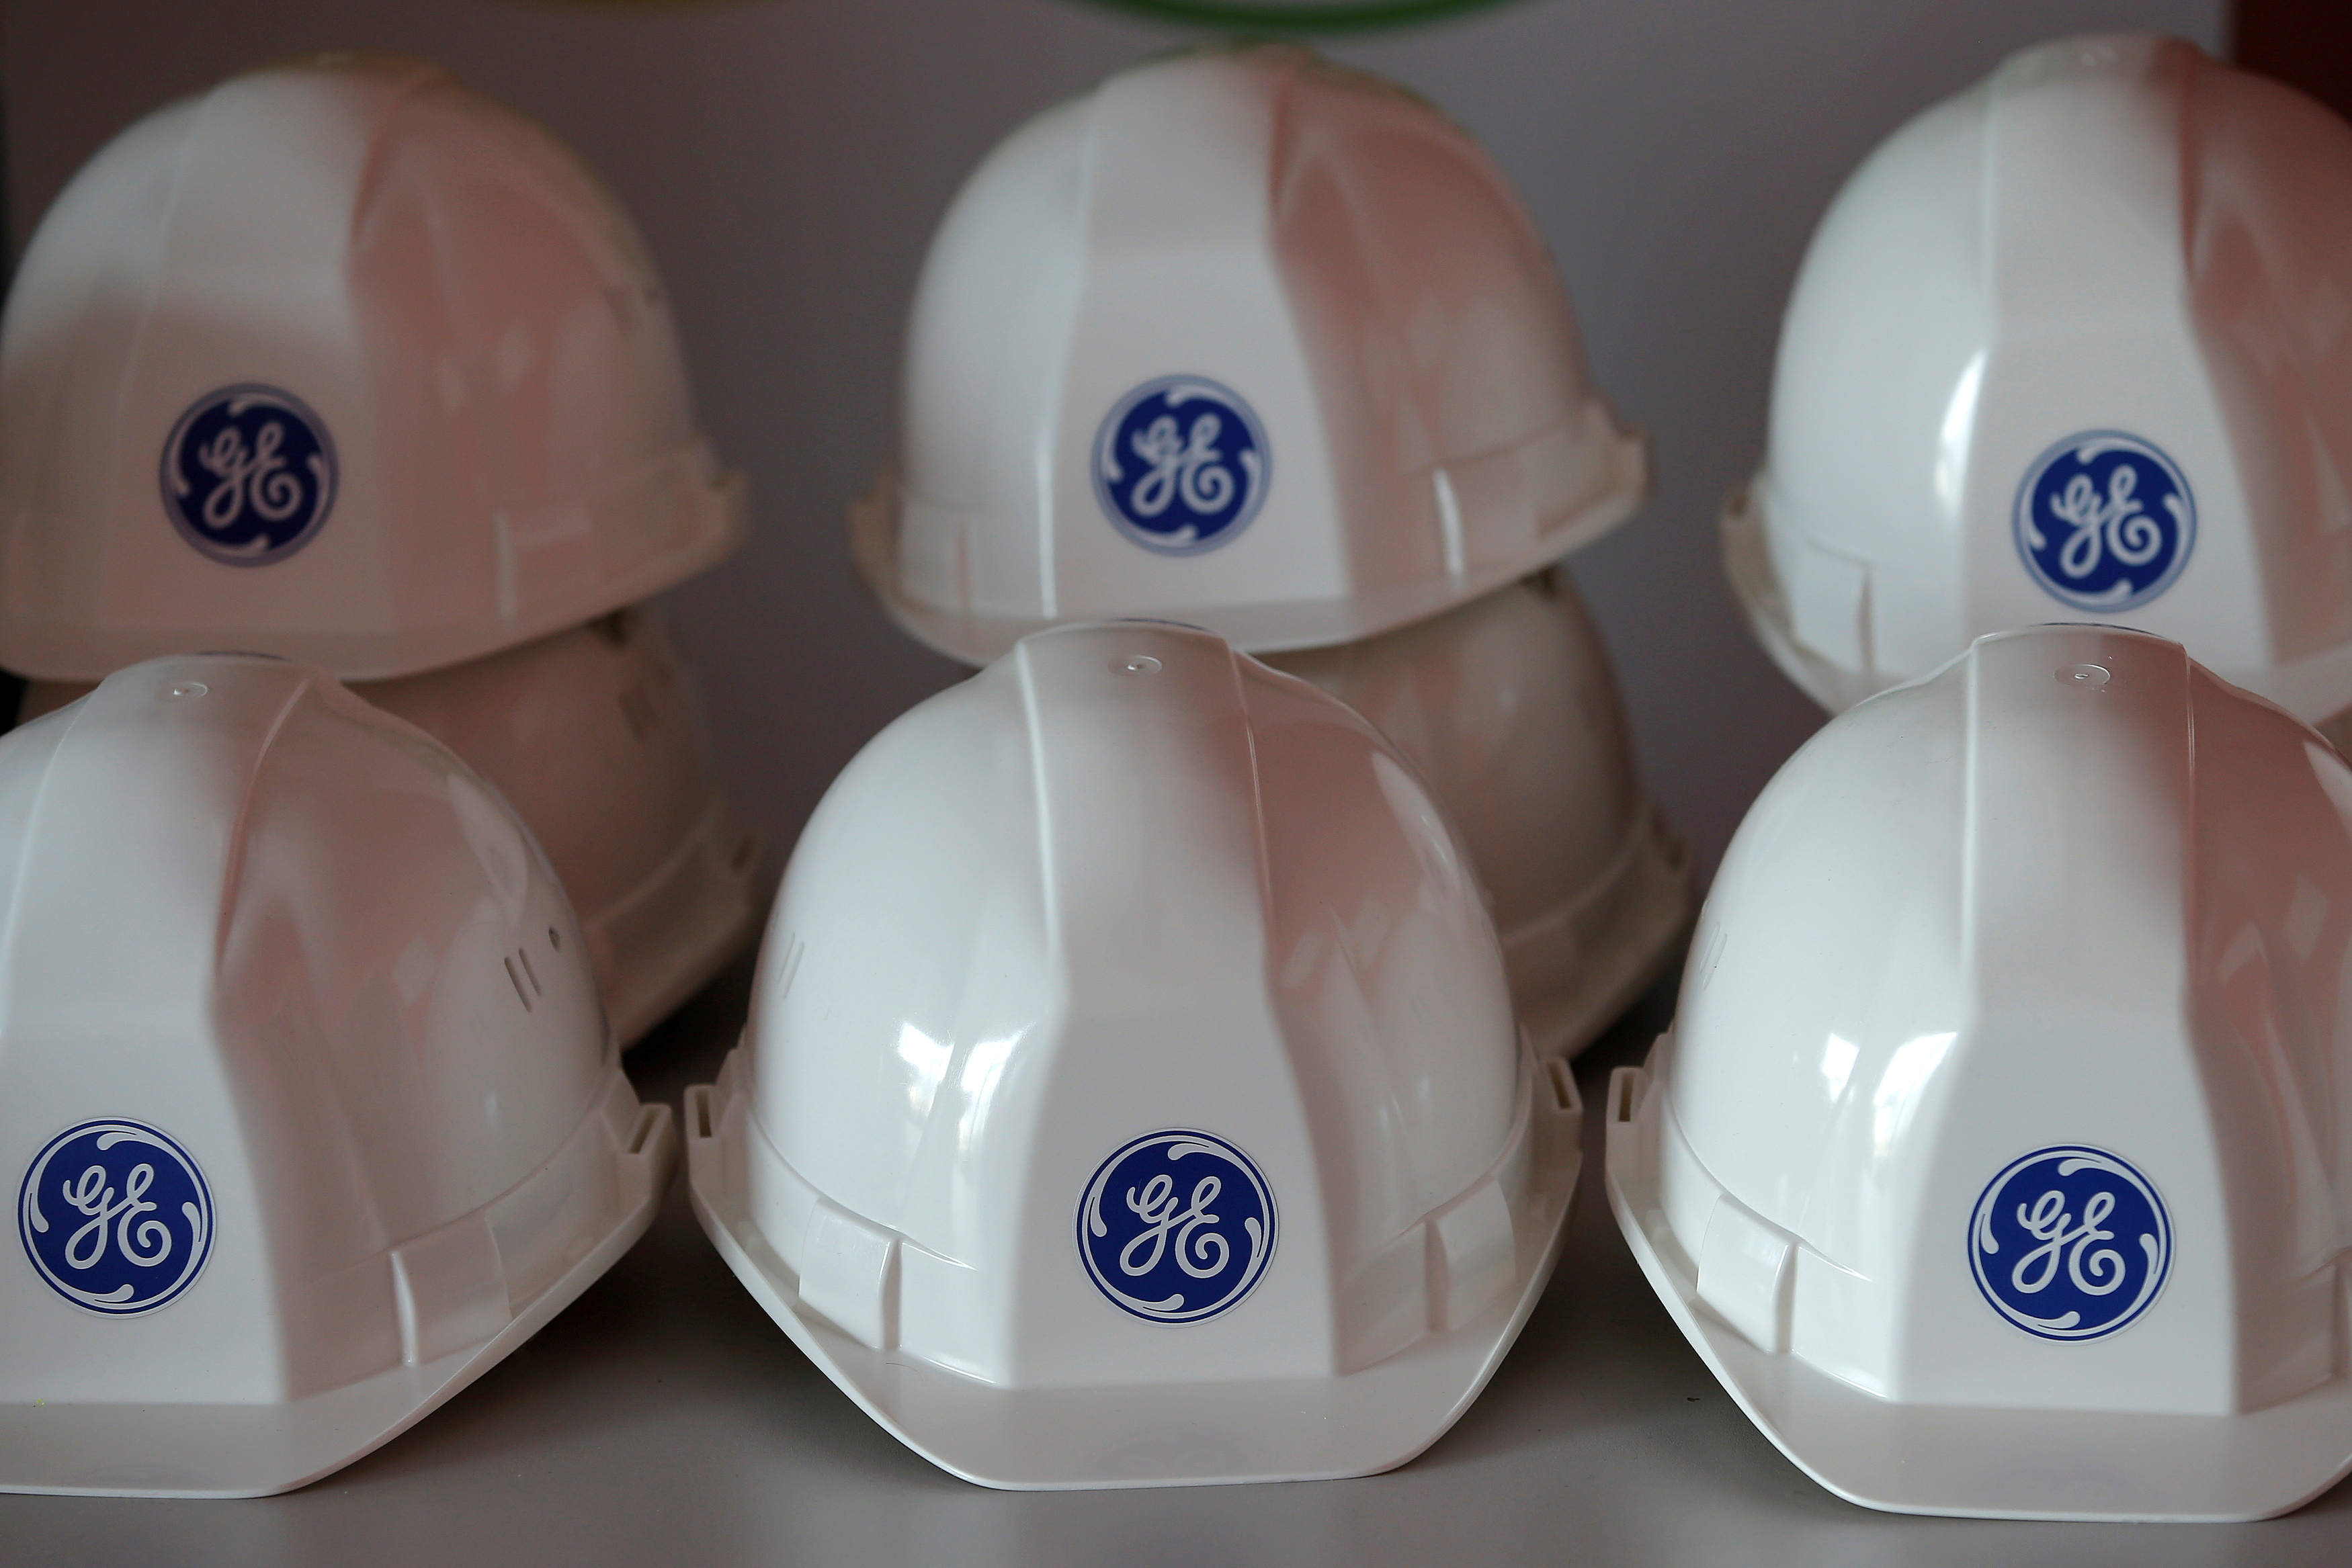 The General Electric logo is pictured on working helmets during a visit at the General Electric offshore wind turbine plant in Montoir-de-Bretagne, near Saint-Nazaire, western France, November 21, 2016. REUTERS/Stephane Mahe/File Photo